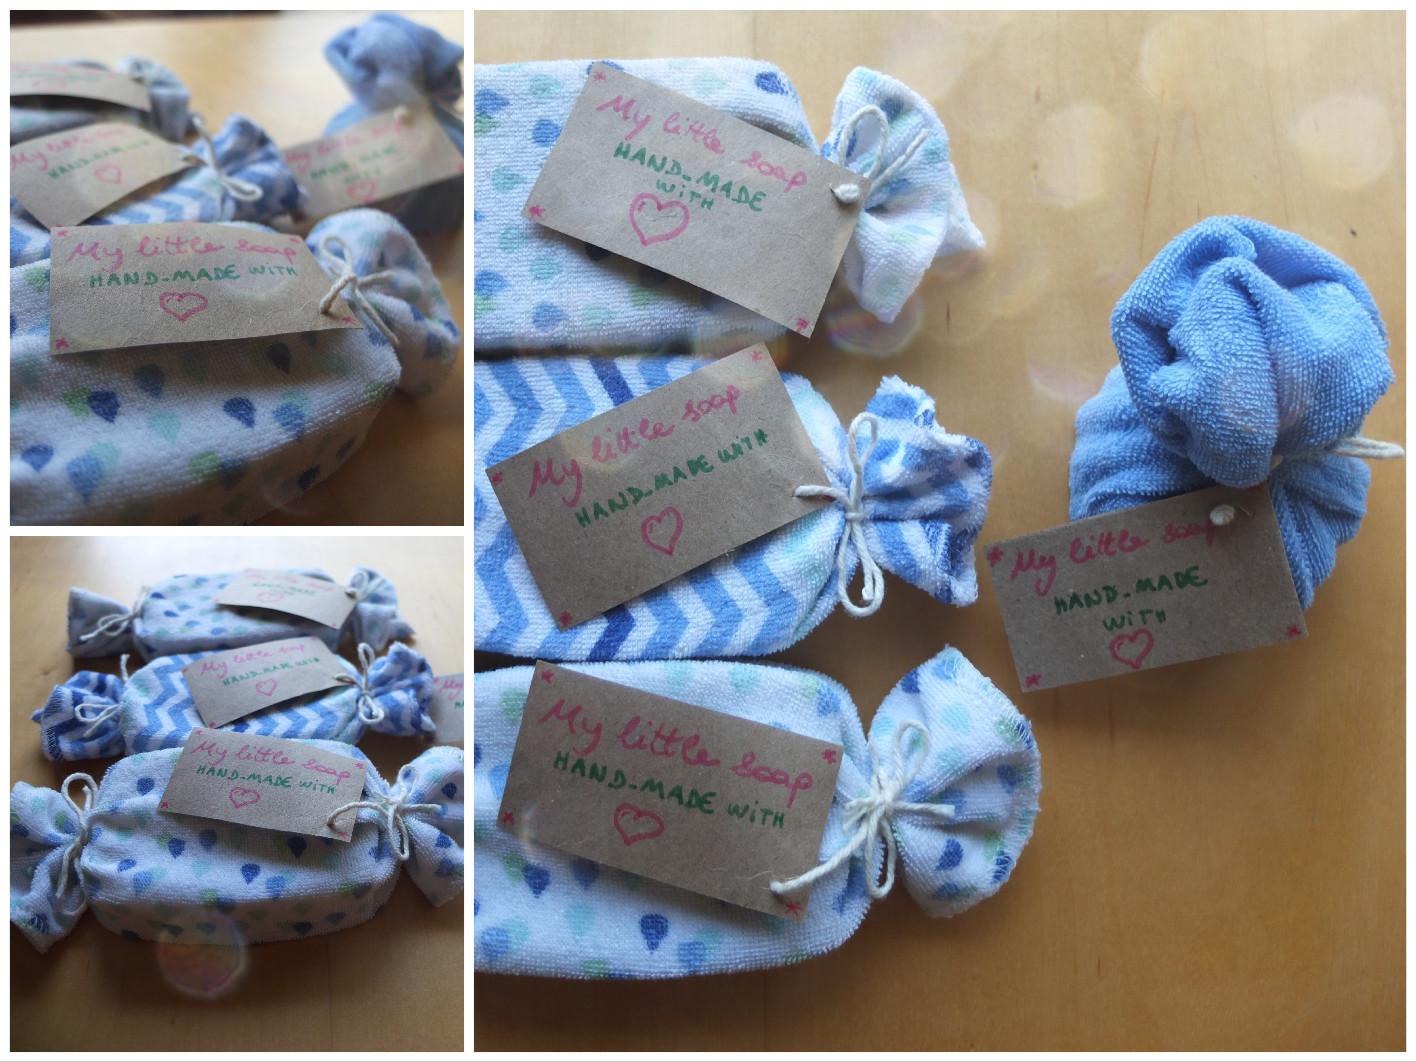 Savons maison saponifi s froid recette facile one footprint - Emballage savon maison ...